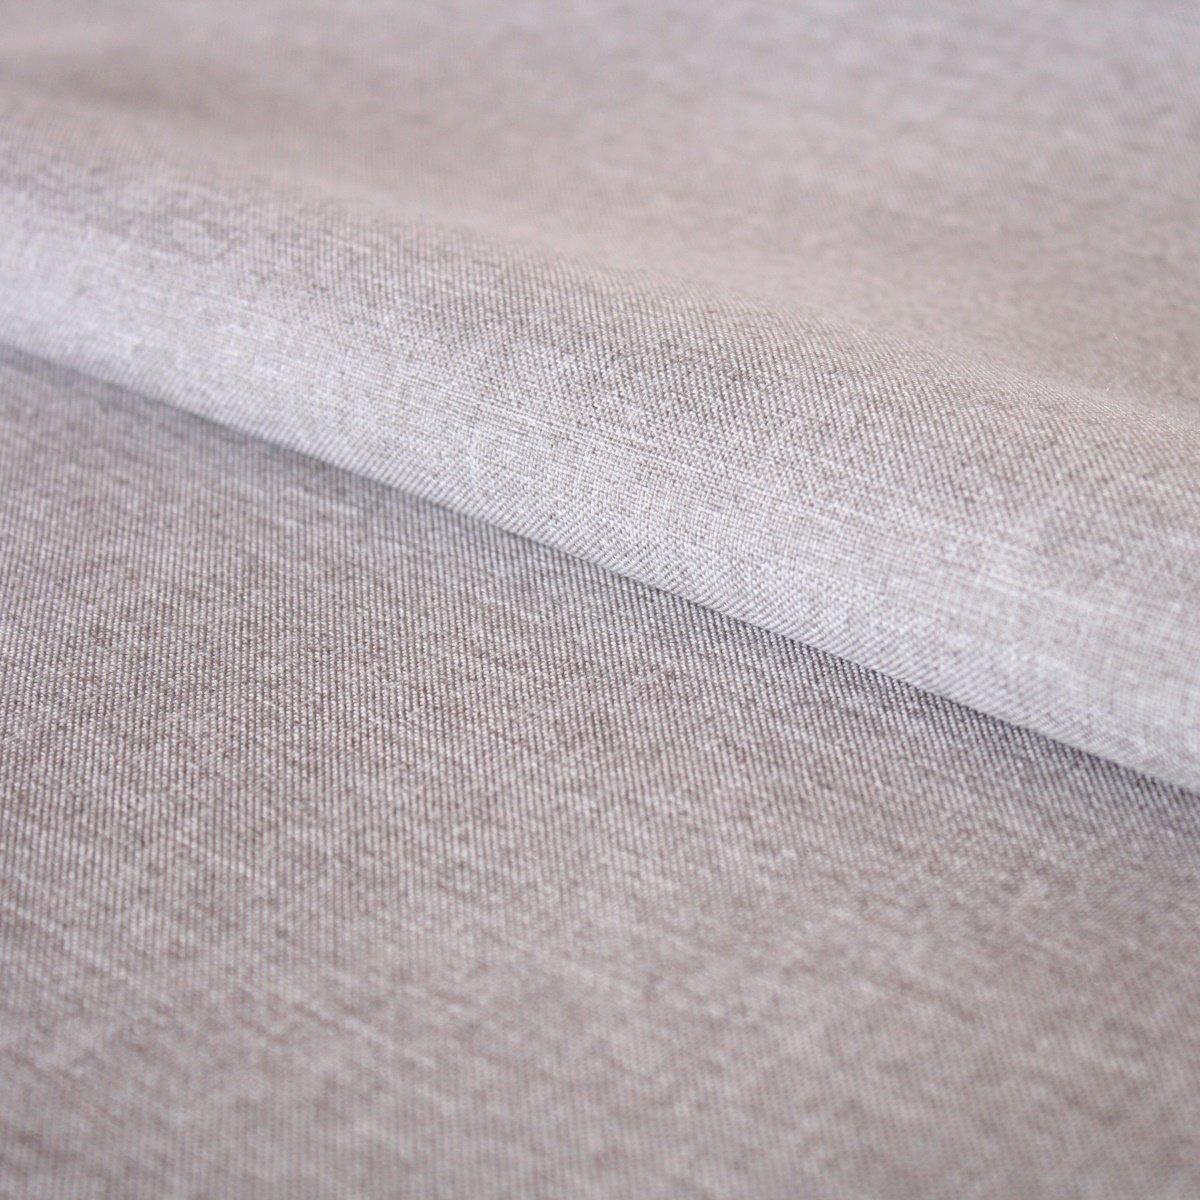 Hans-Textil-Shop Stoff Meterware Uni Grau meliert Outdoor, Polyester ...